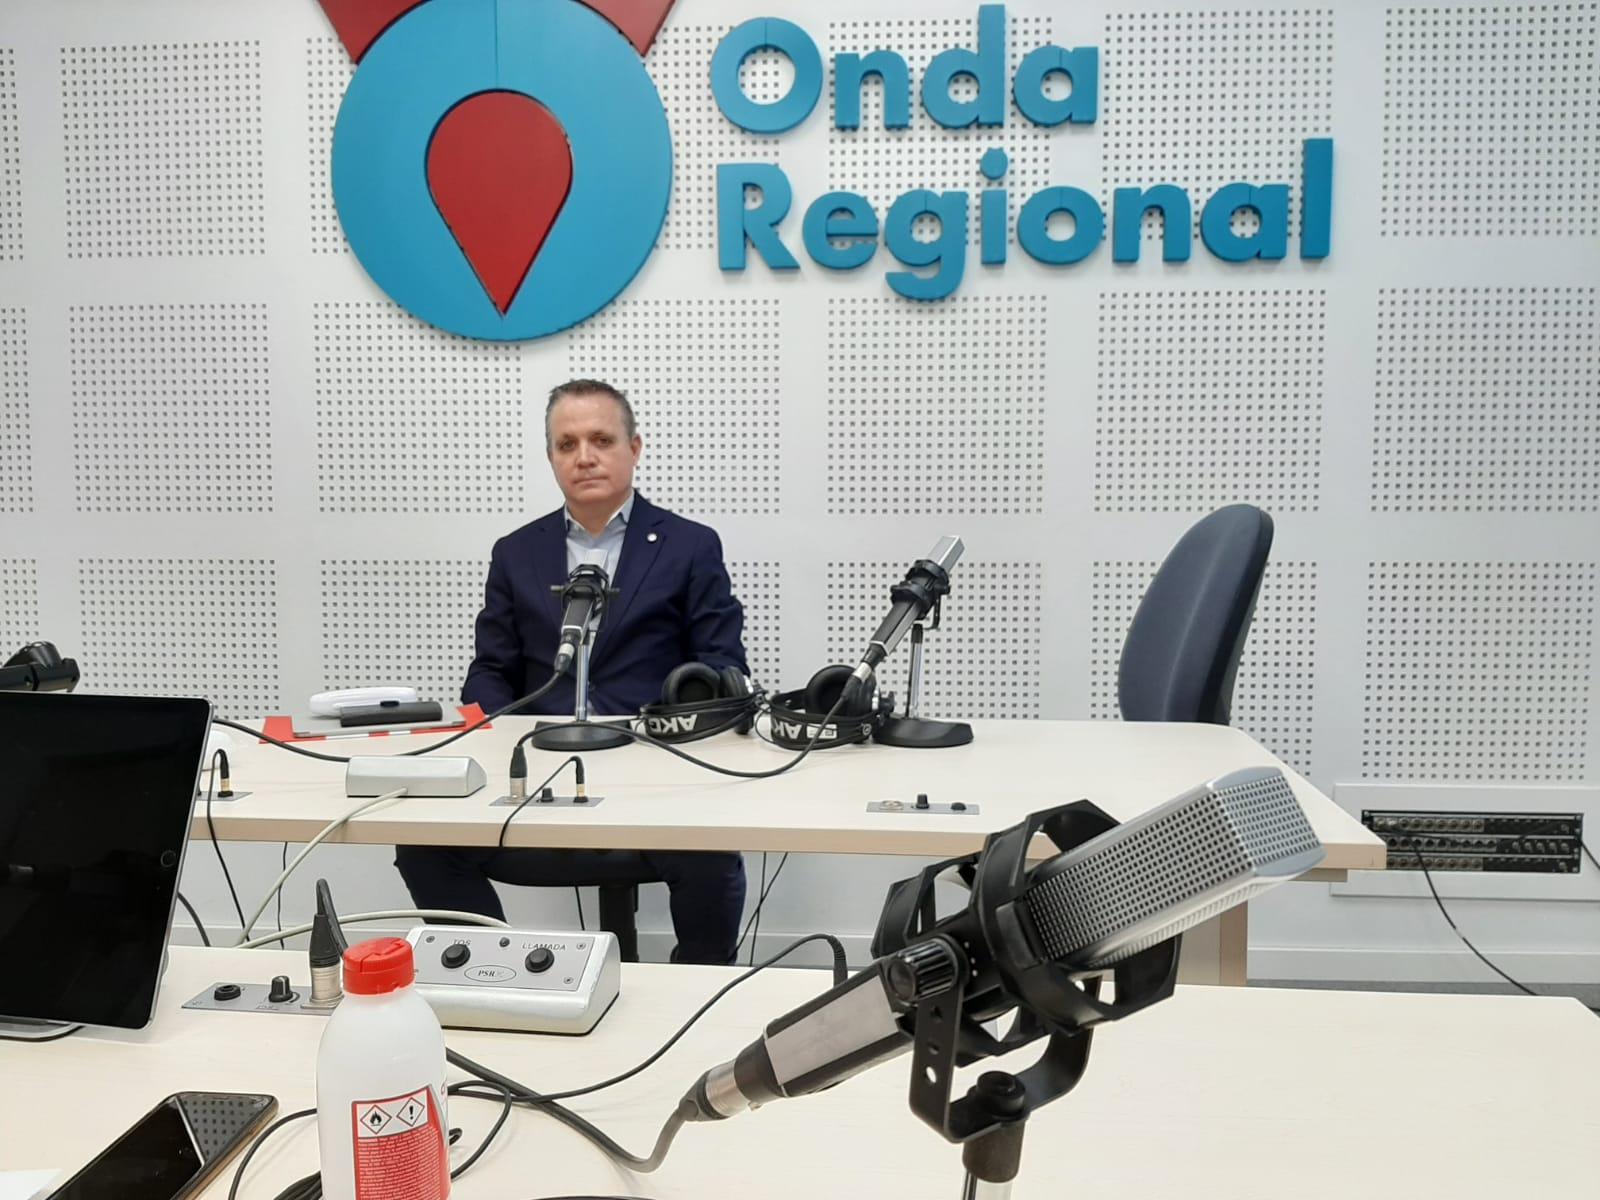 Entrevista a José Ramón Blázquez, presidente de APIRM, en Onda Regional